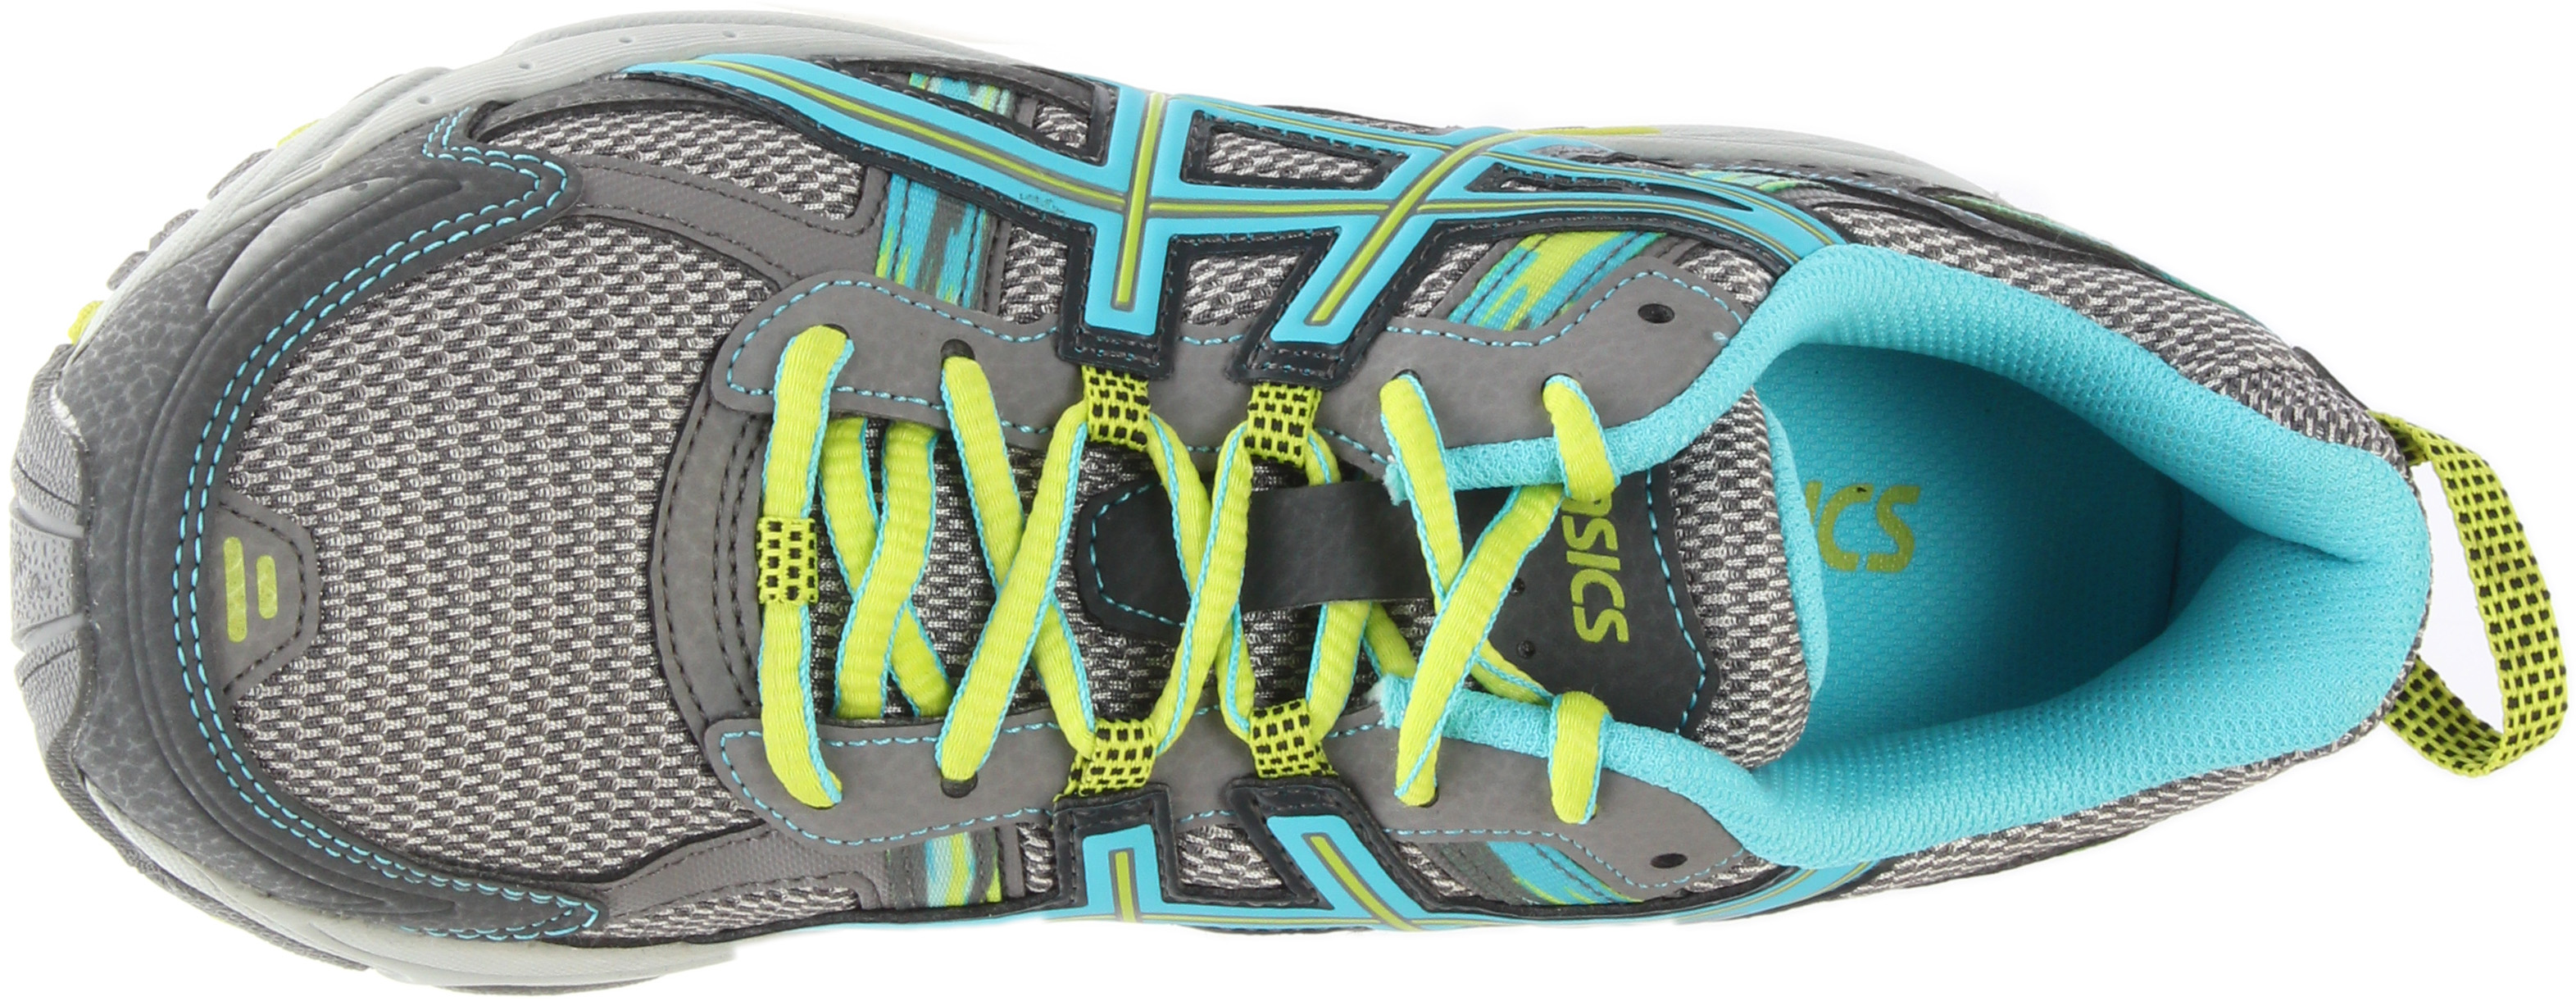 da6a743d3575 Asics - Asics Women s Gel-Venture 5 Silver Grey   Turquoise Lime Punch  Ankle-High Running Shoe - 9W - Walmart.com